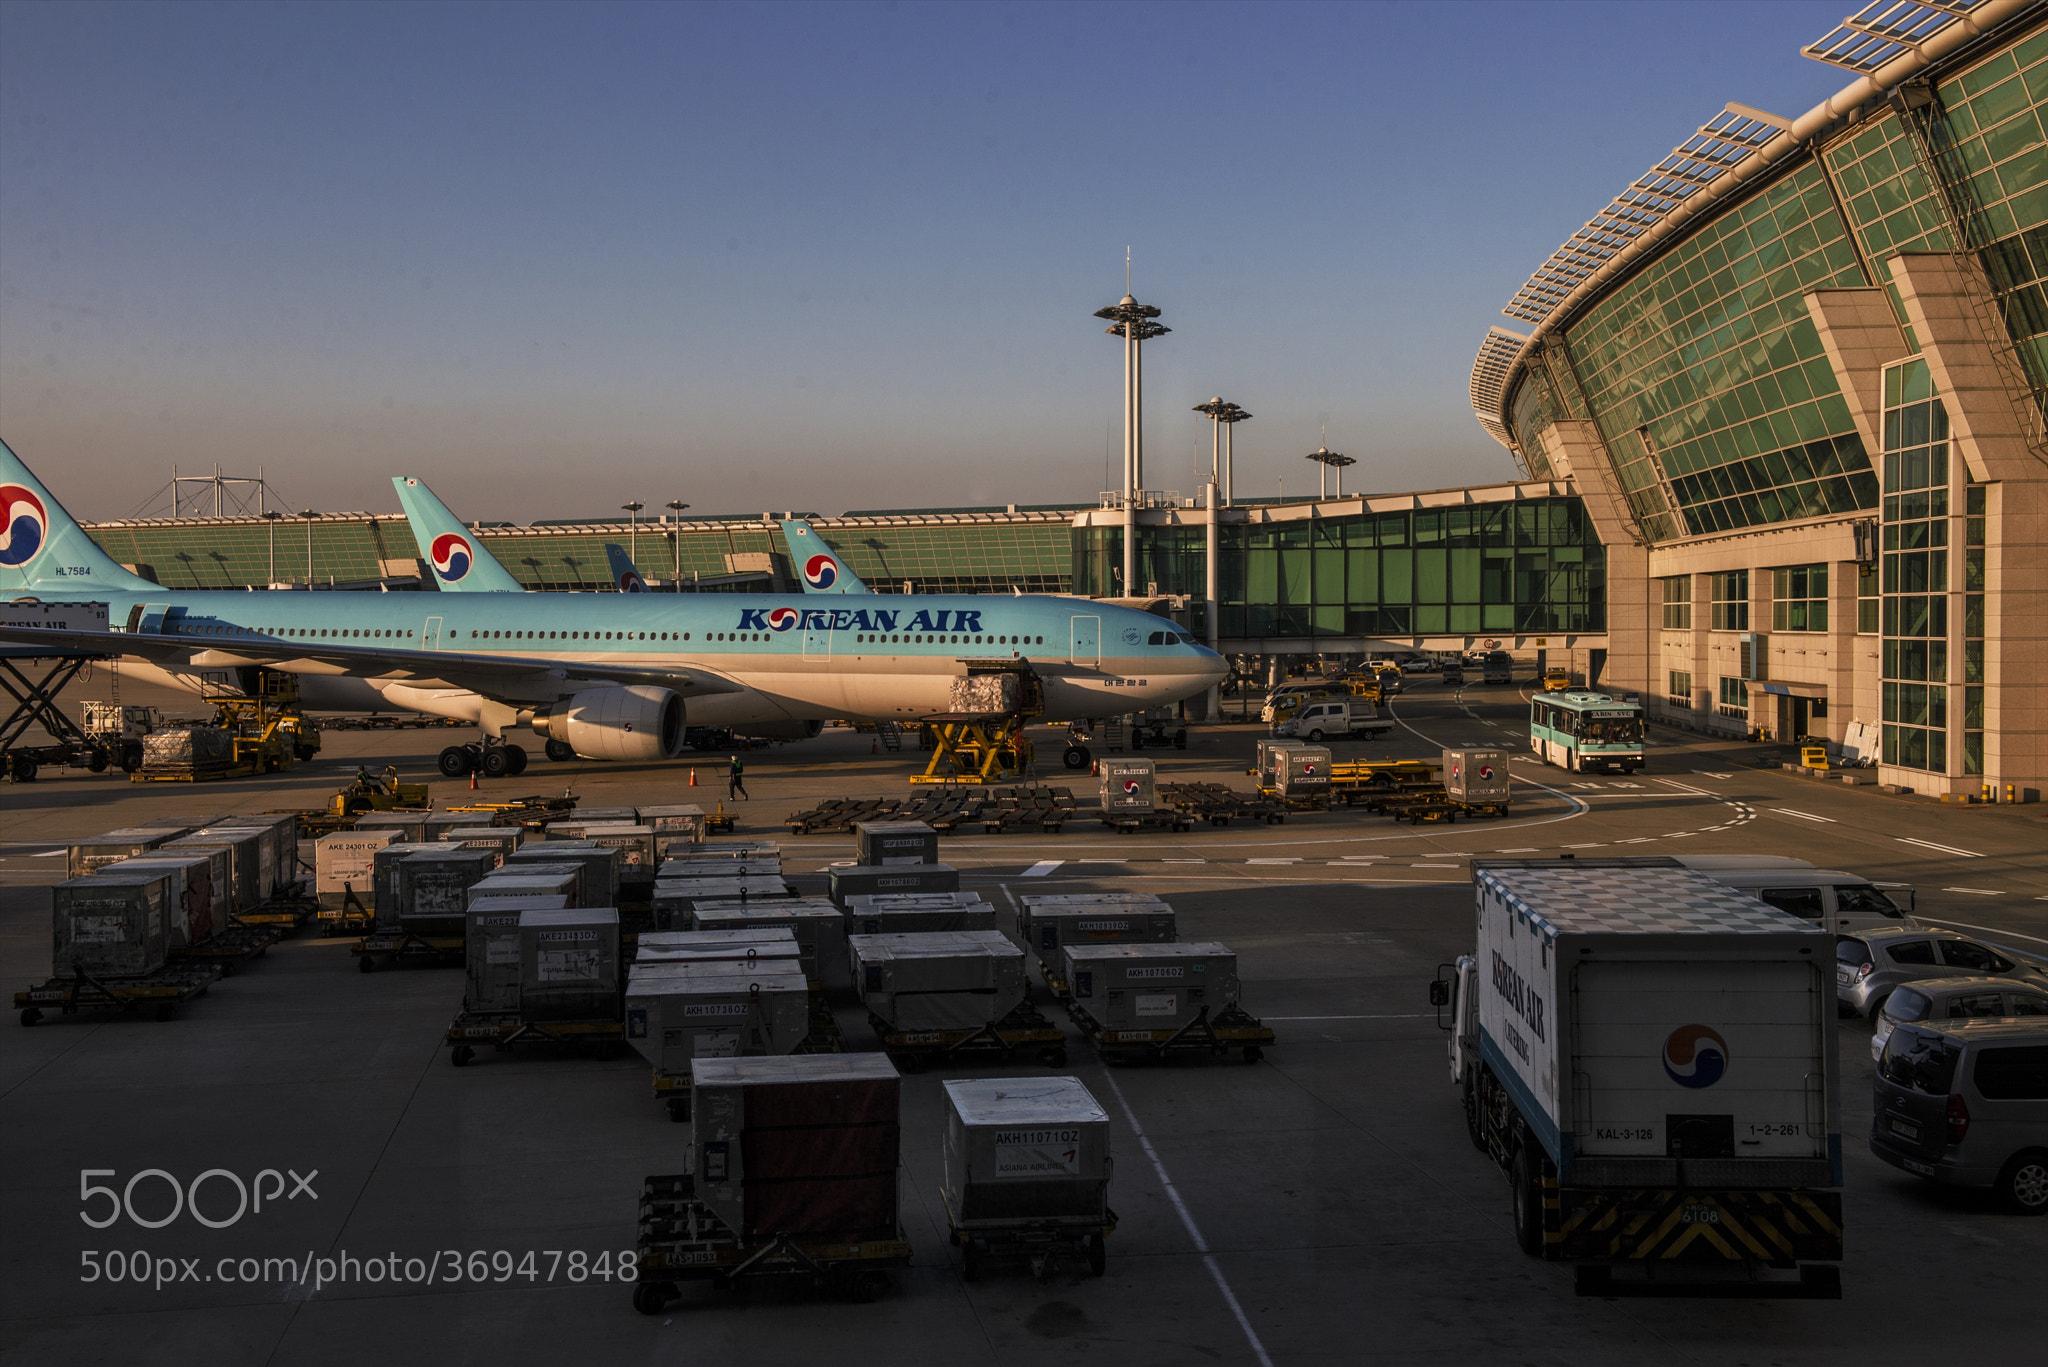 Photograph Airport Sunset by hugh dornan on 500px